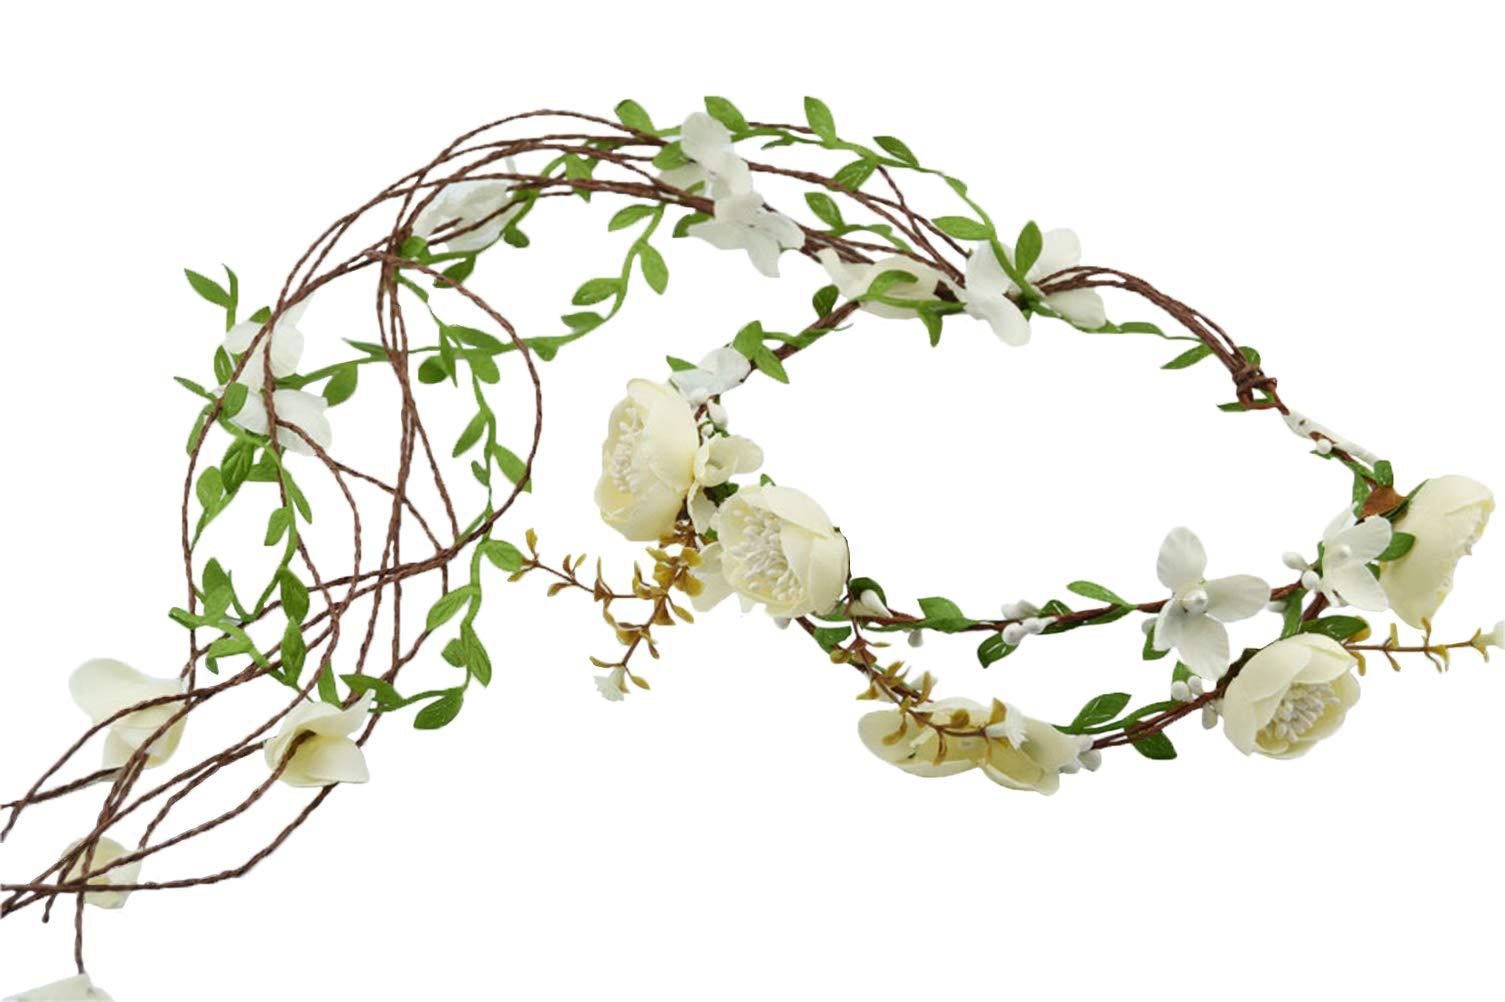 Vivivalue Handmade Boho Flower Headband Hair Wreath Halo Floral Garland Crown Headpiece with Ribbon Festival Wedding White